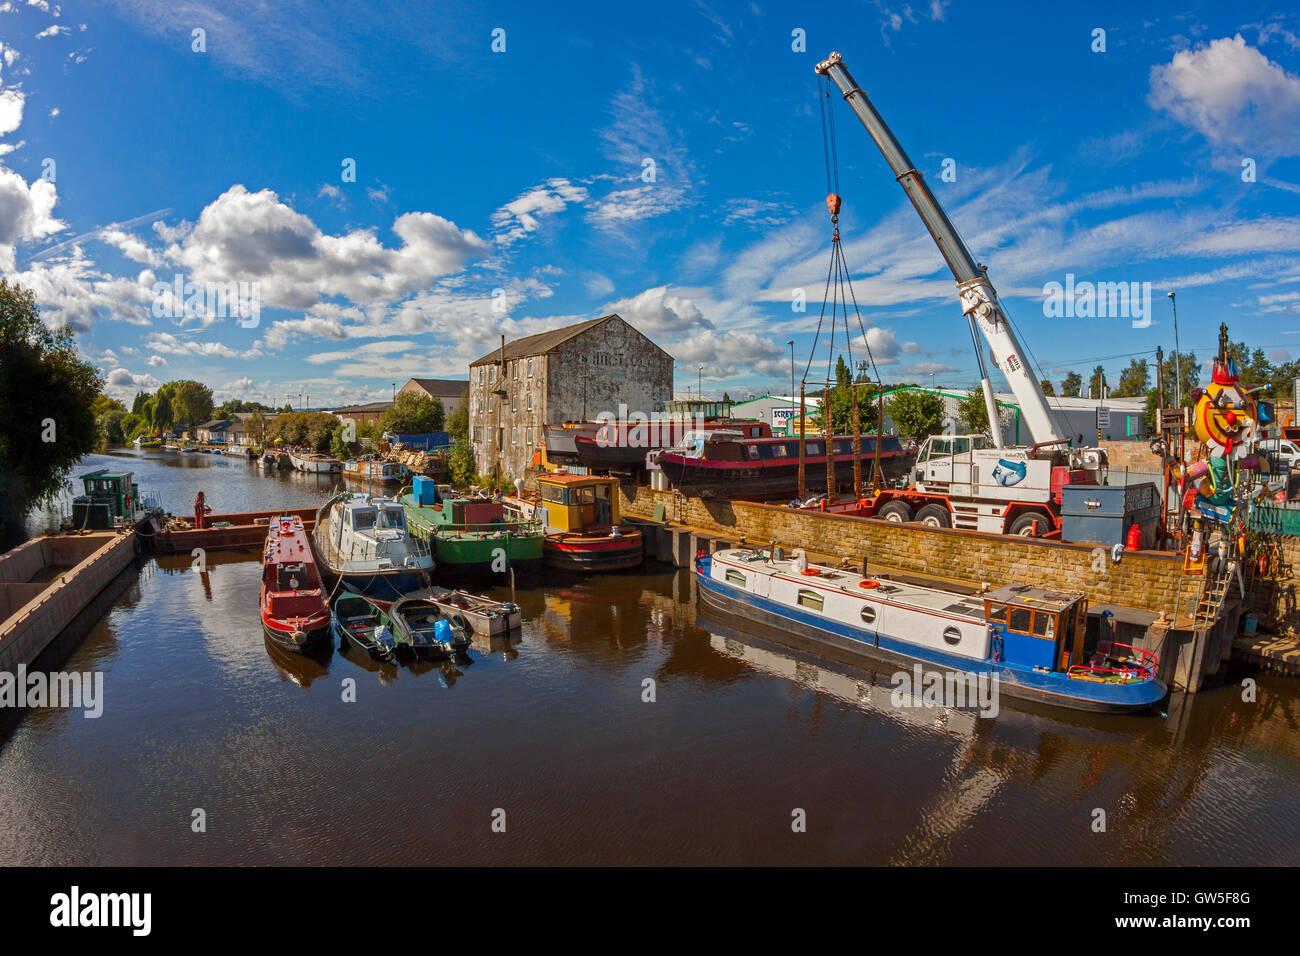 Boatyard, Calder & Hebble Navigation, Wakefield - Stock Image